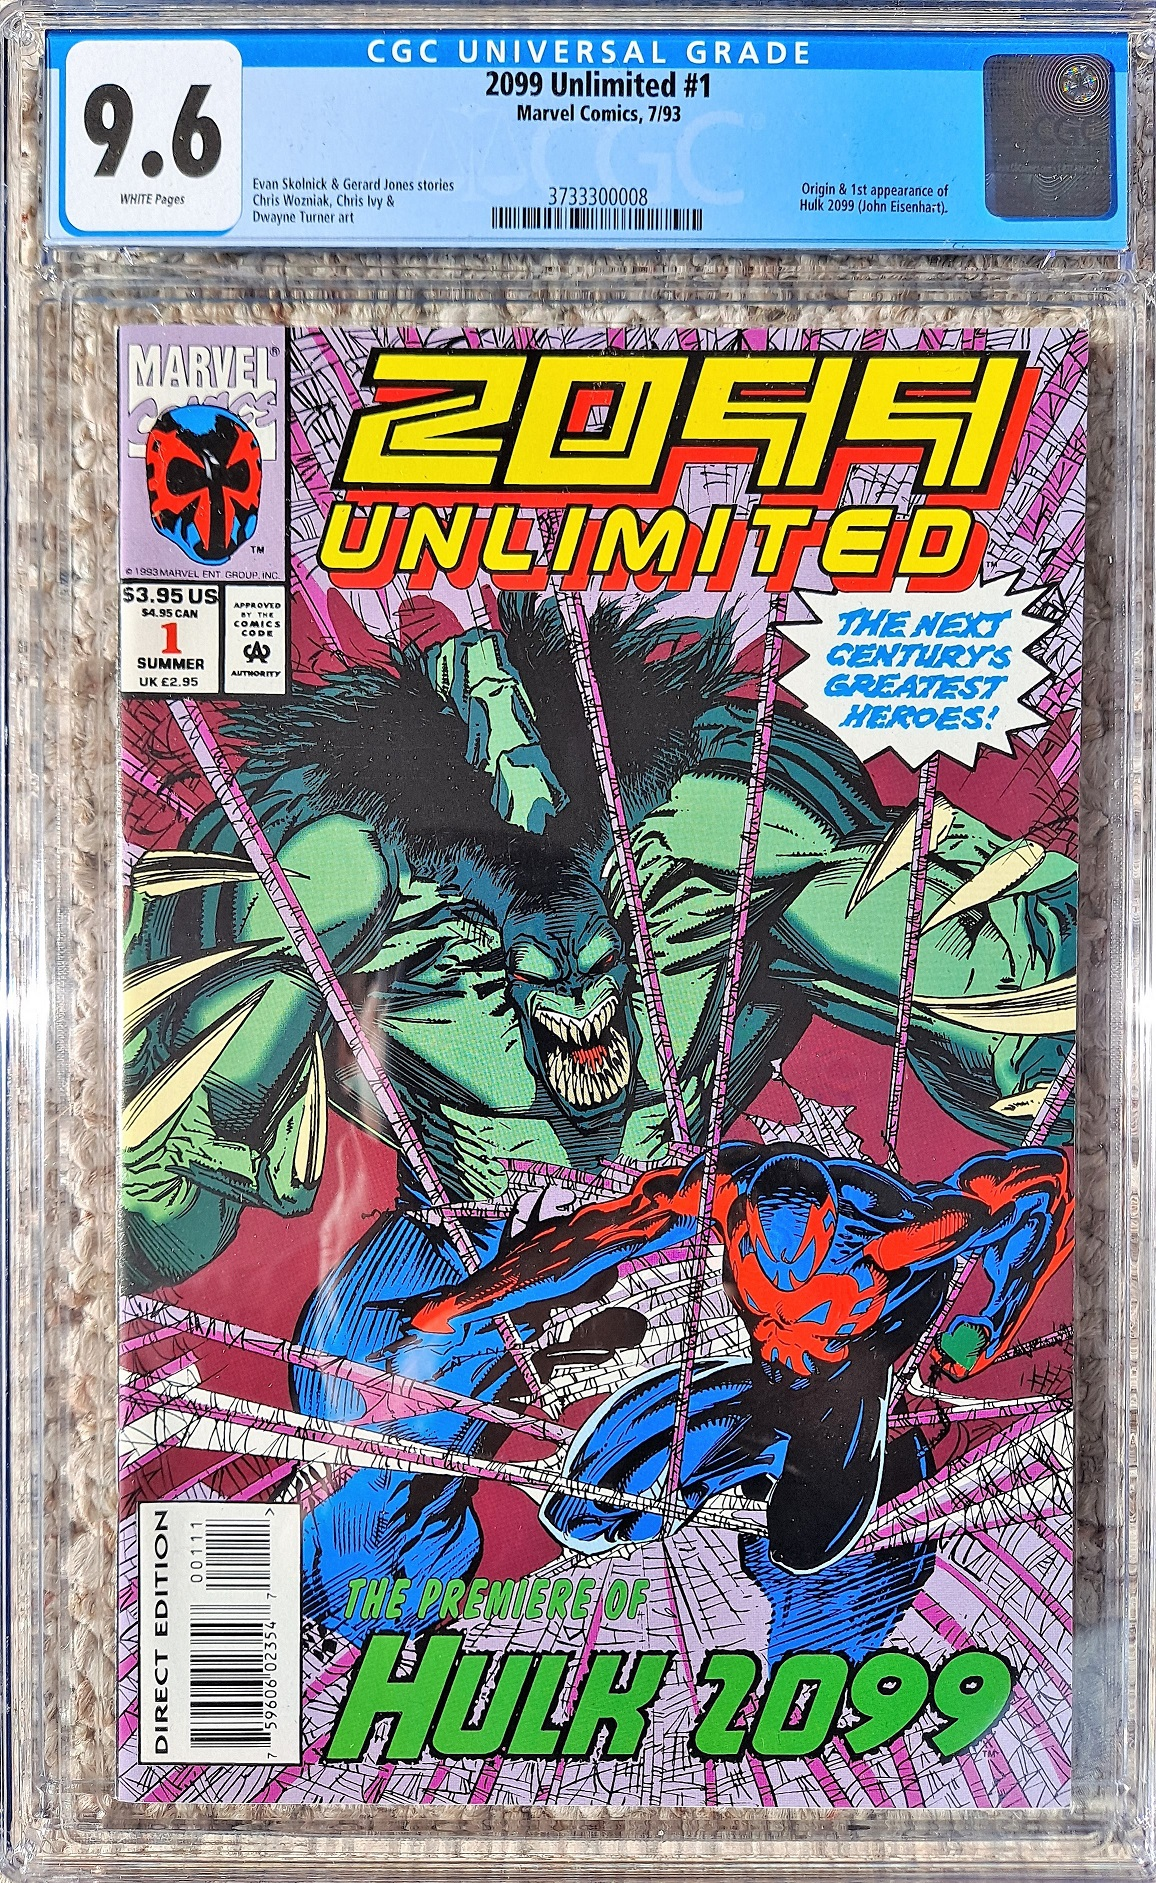 2099 Unlimited #1 CGC 9.6 w